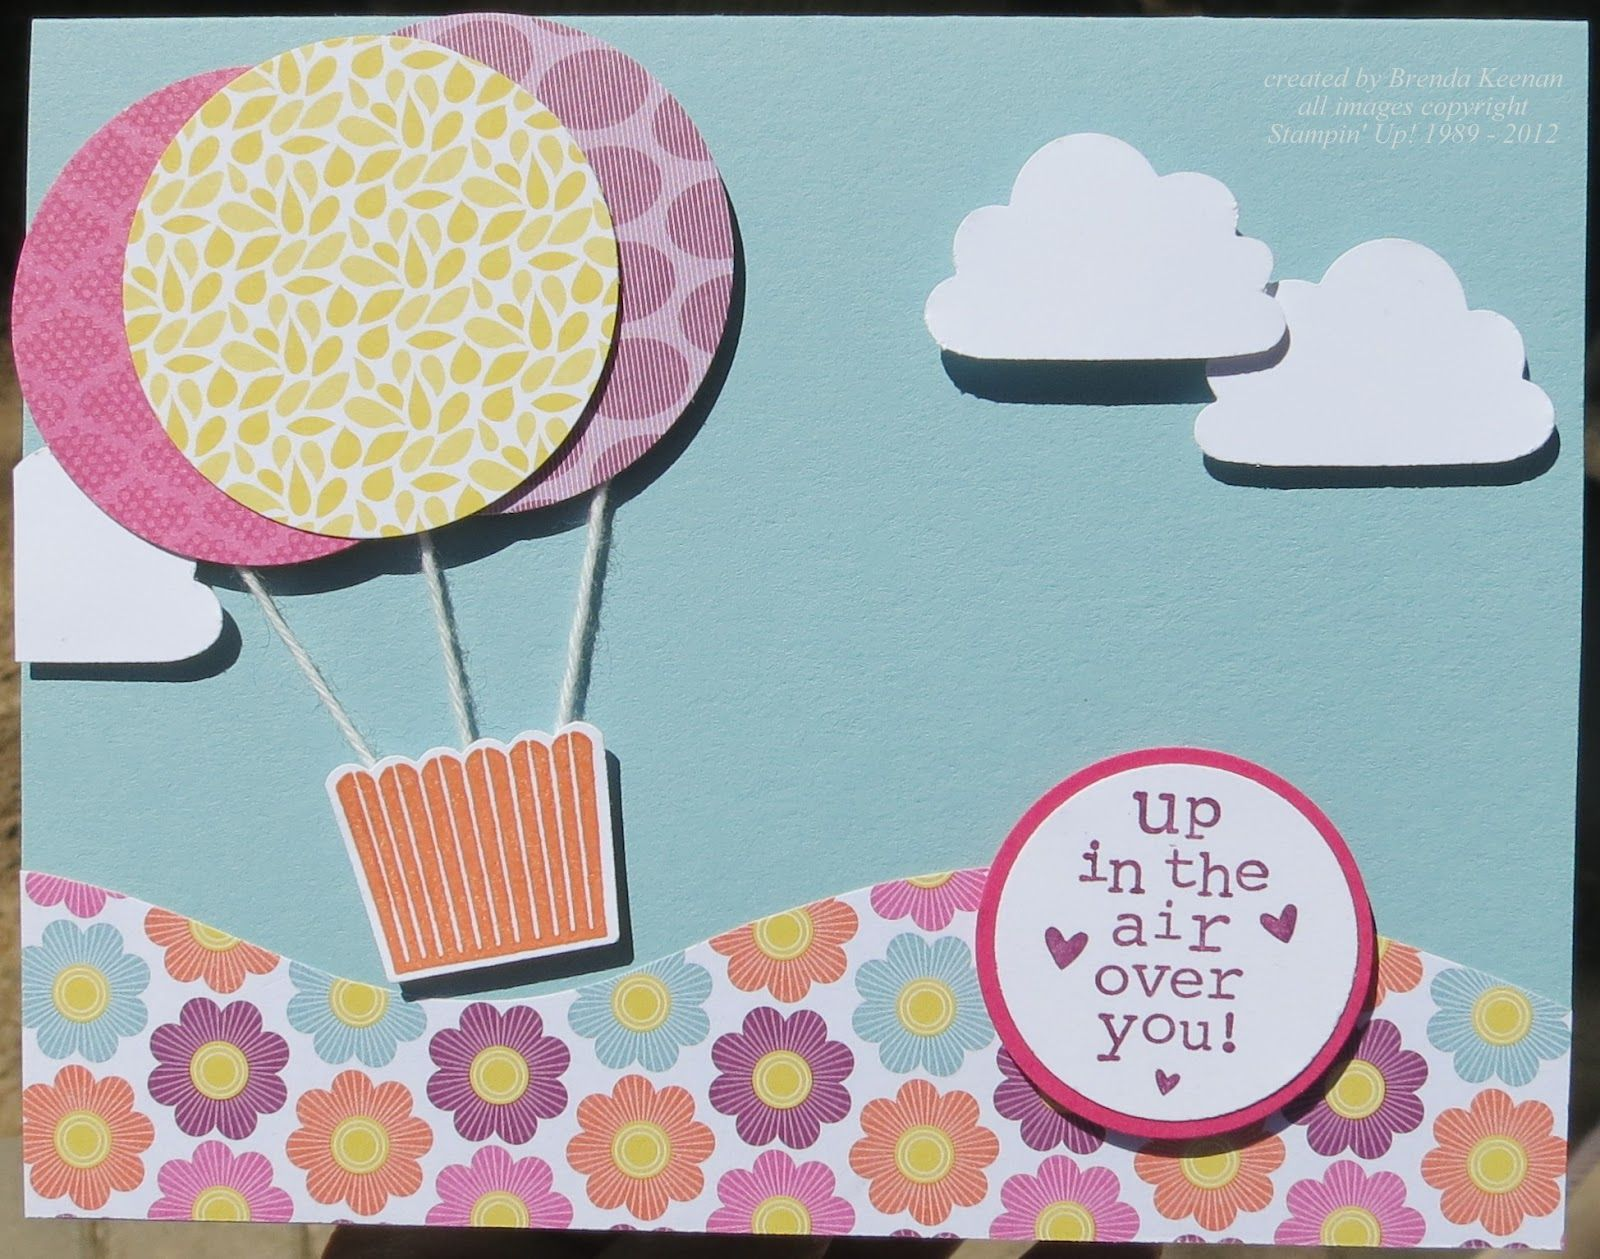 Keenan kreations stampin up cupcake punch for hot air balloons keenan kreations stampin up cupcake punch for hot air balloons jeuxipadfo Gallery